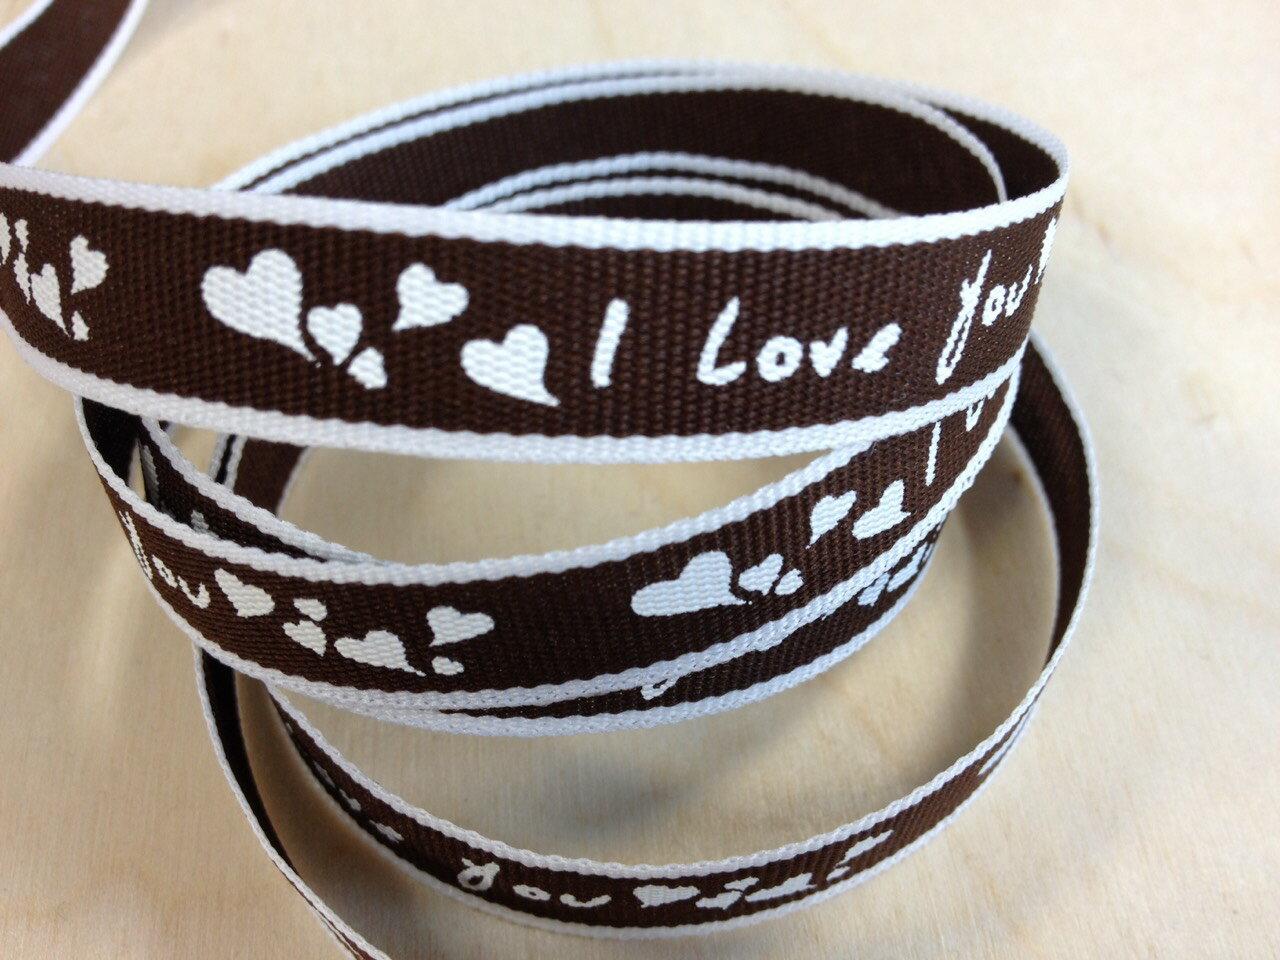 【Crystal Rose緞帶專賣店】love 愛心緞帶 12mm 3碼 (9色) 7